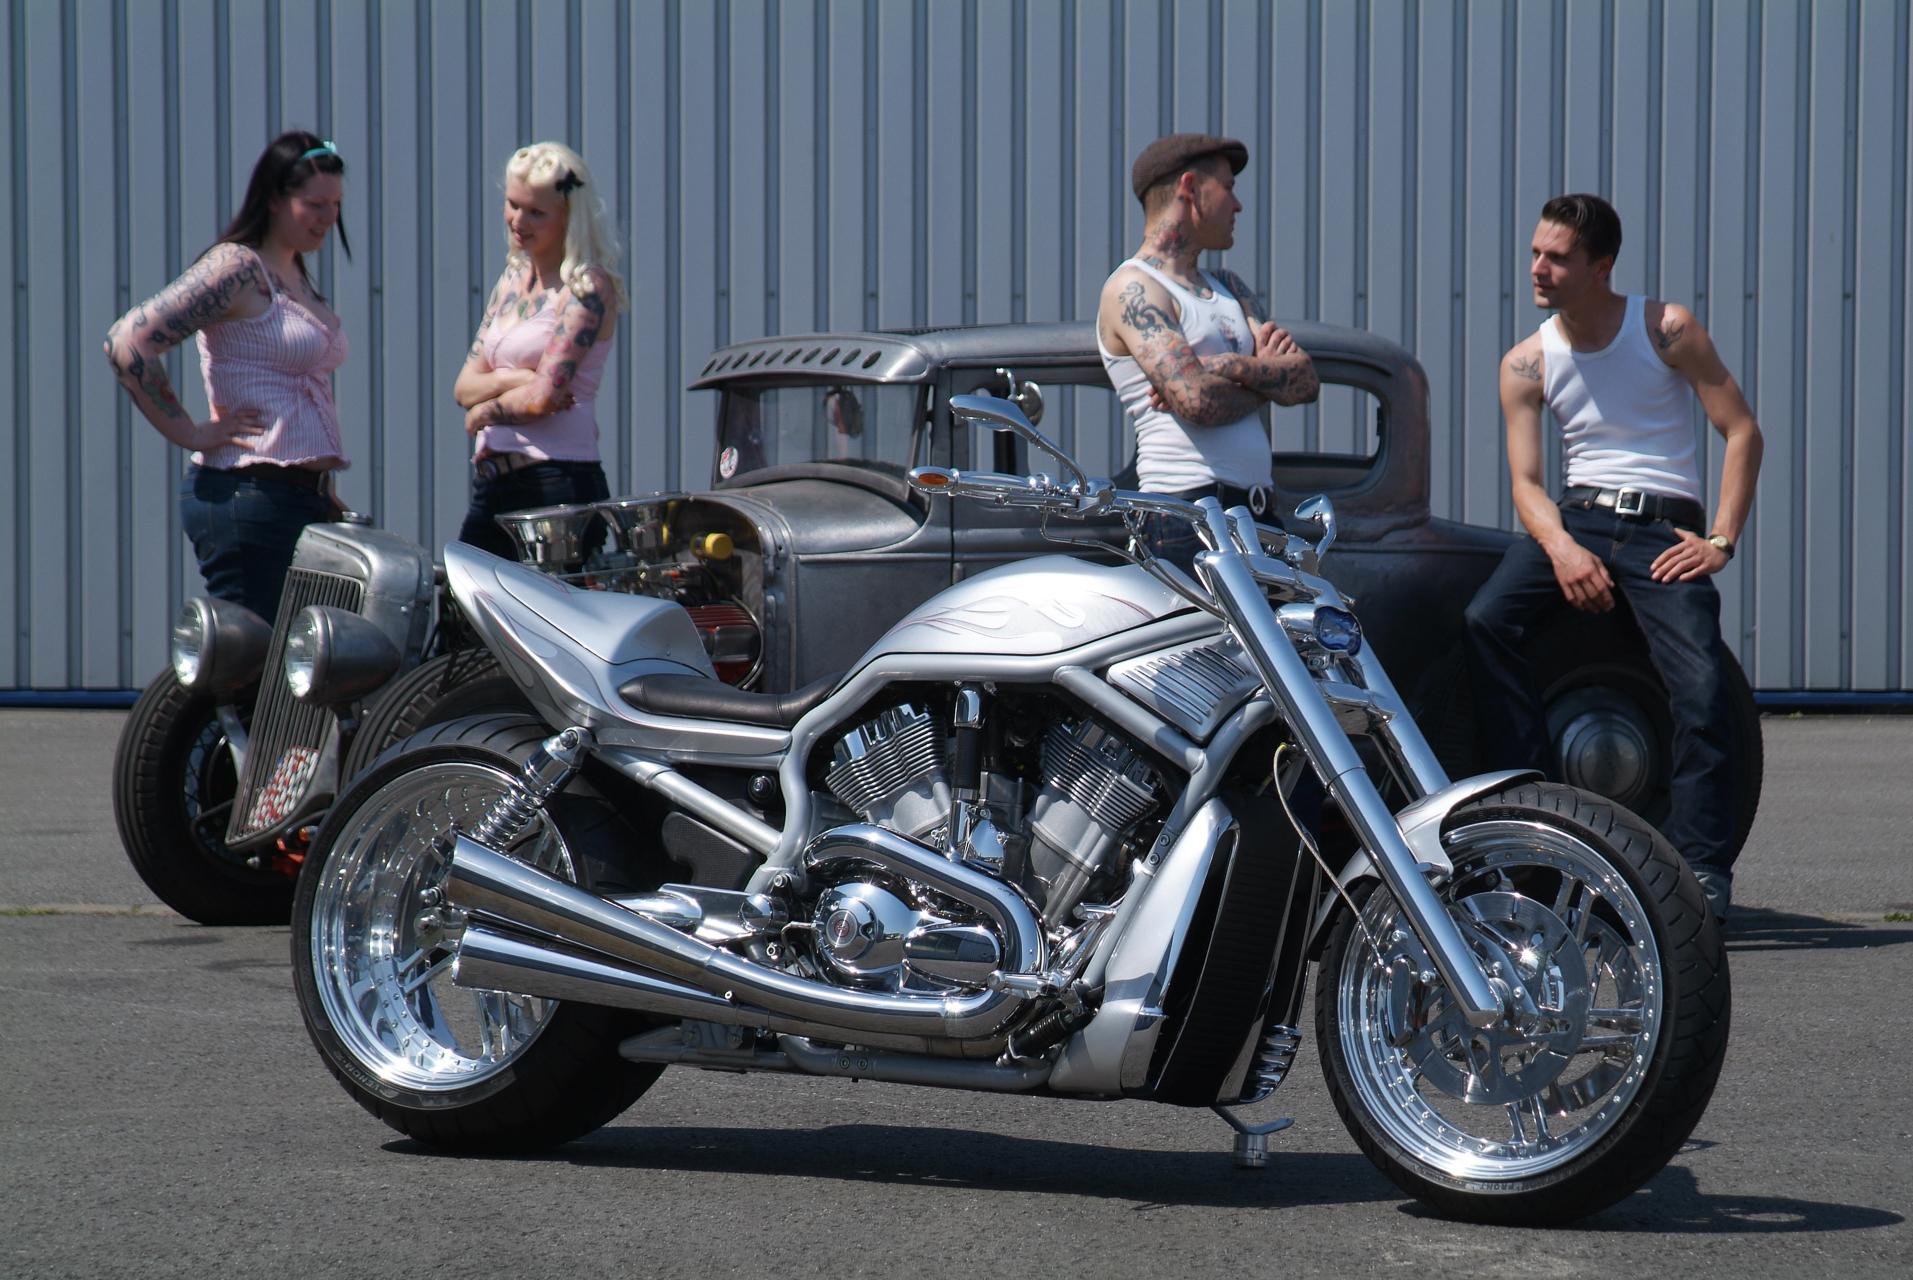 Hot Rod Harley >> Thunderbike Hot Rod Custombike Harley Davidson Gallery